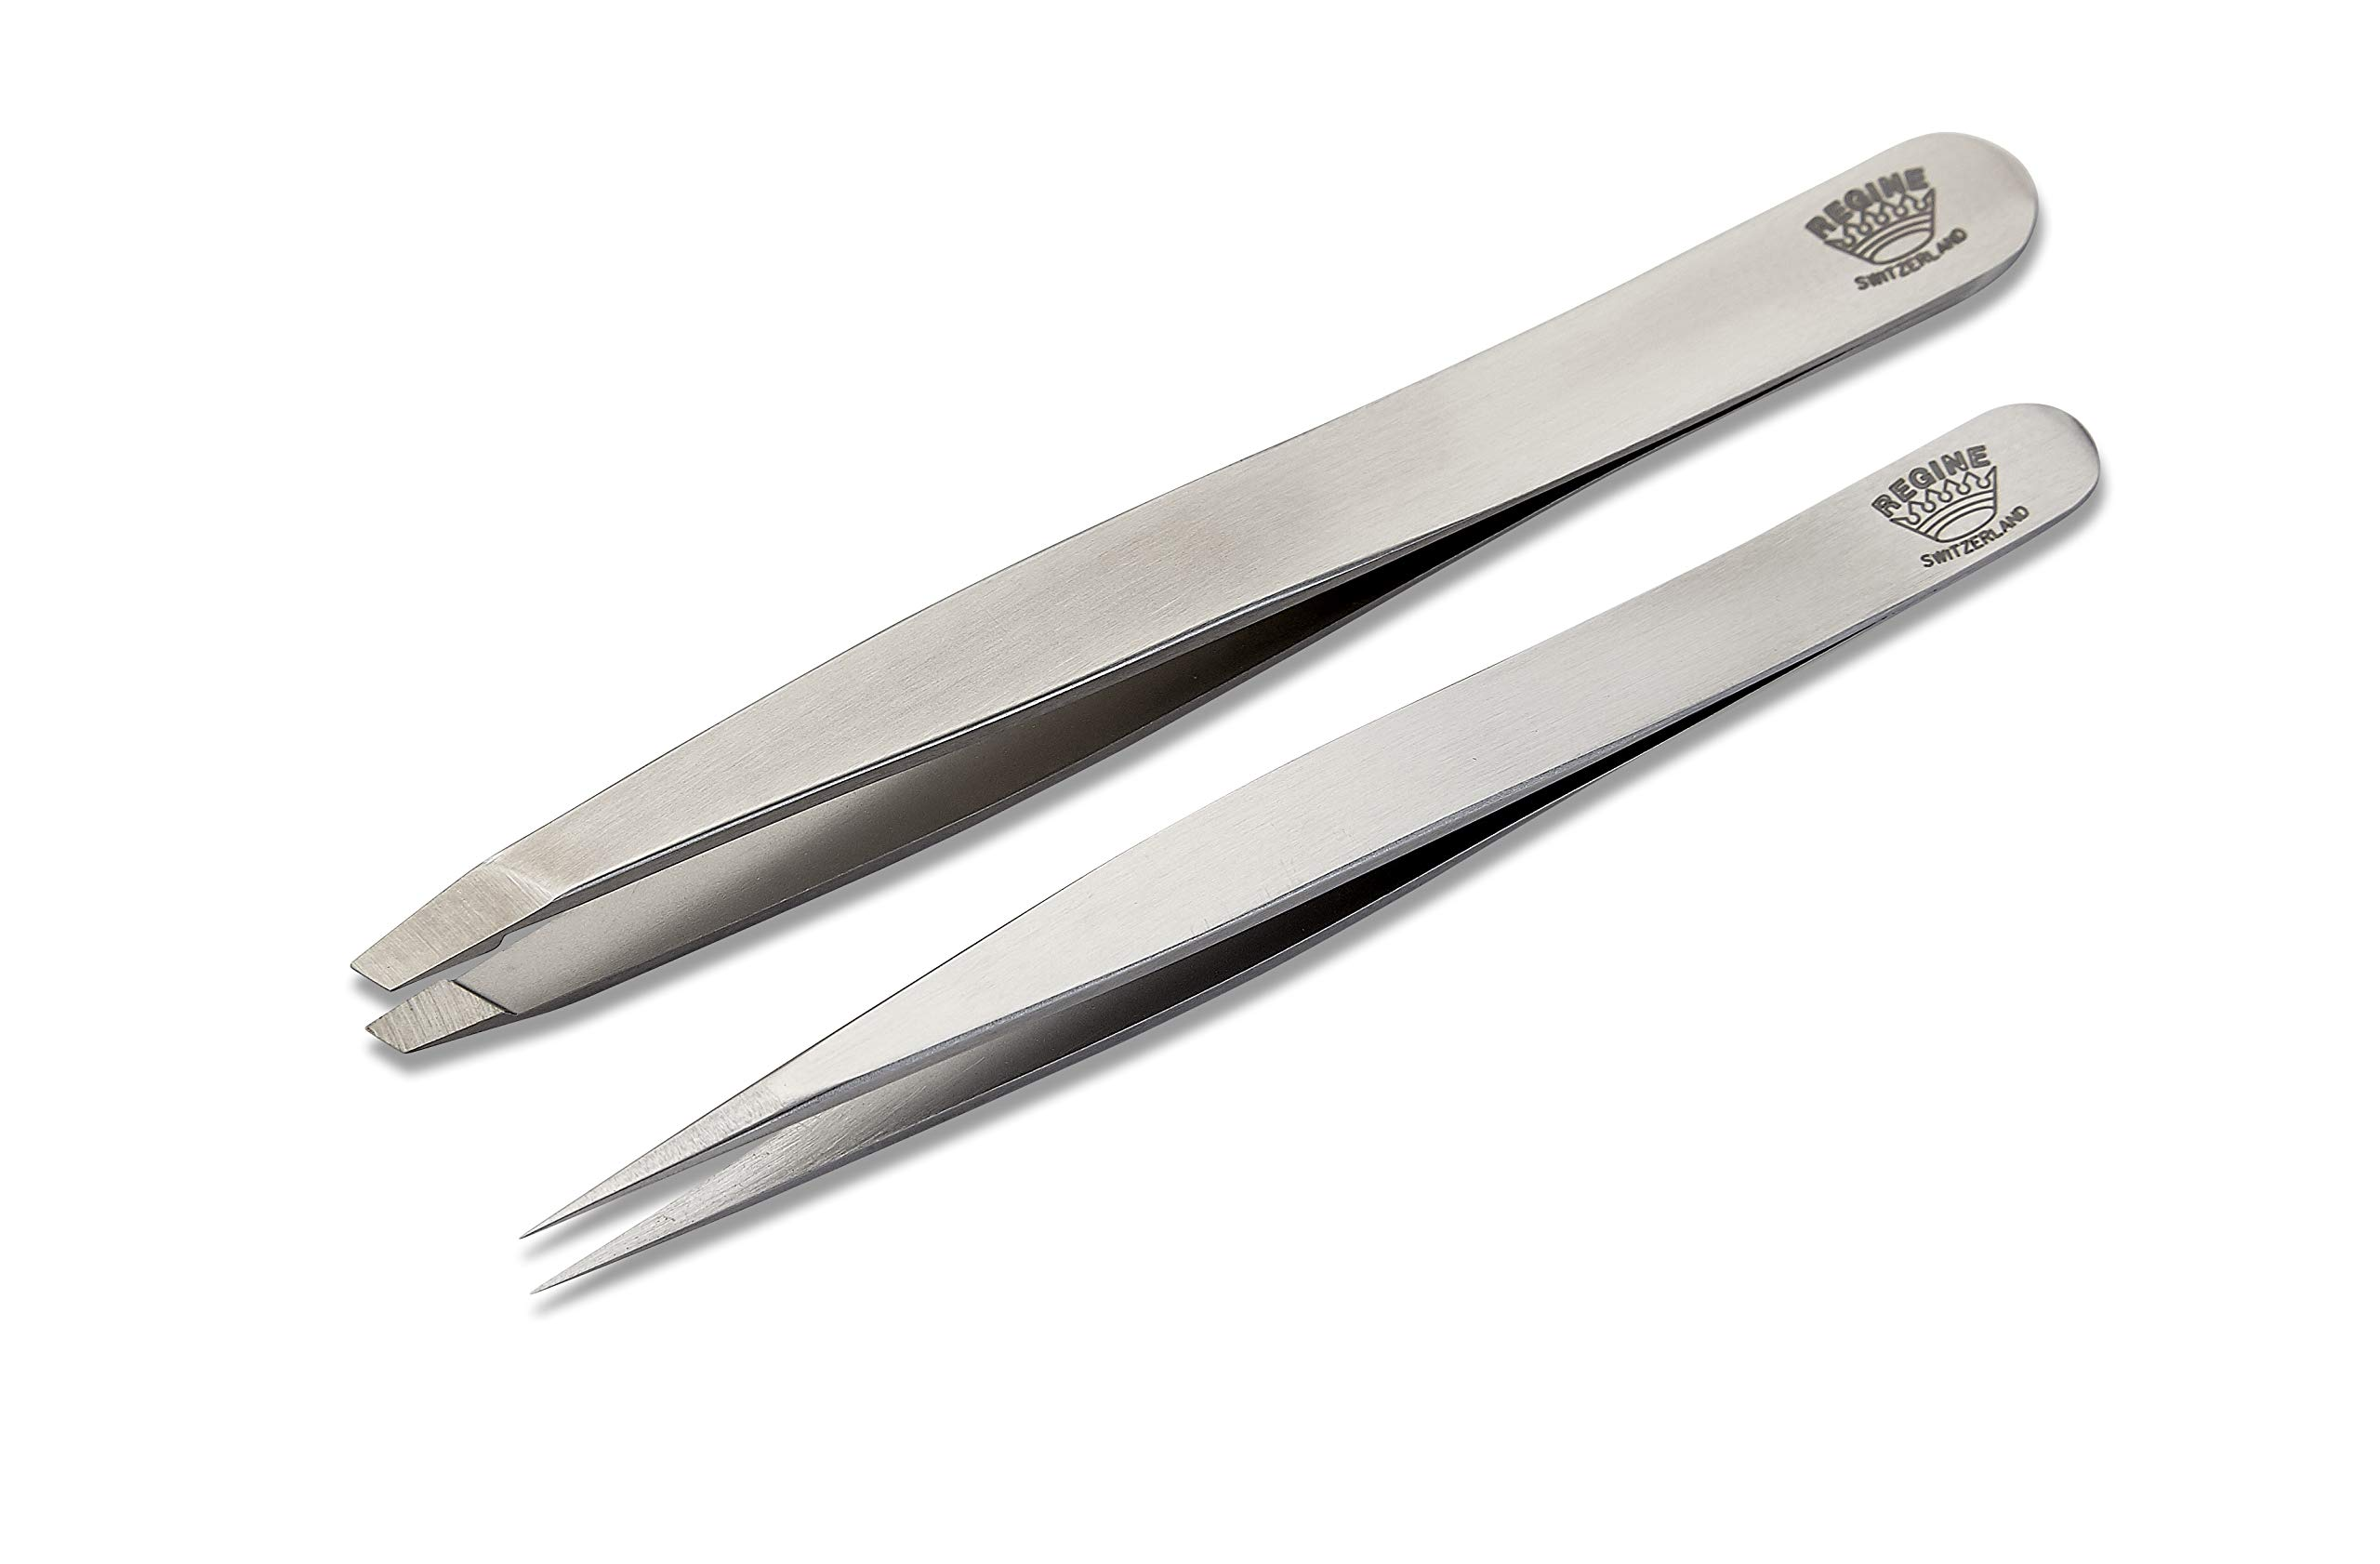 Regine Switzerland | Combo Pack Splinter Tip and Slant Tip Tweezers | 100% Handmade | Surgical Grade Stainless Steel | Professional Precision Eyebrow and Hair Remover | World's Best Tweezers